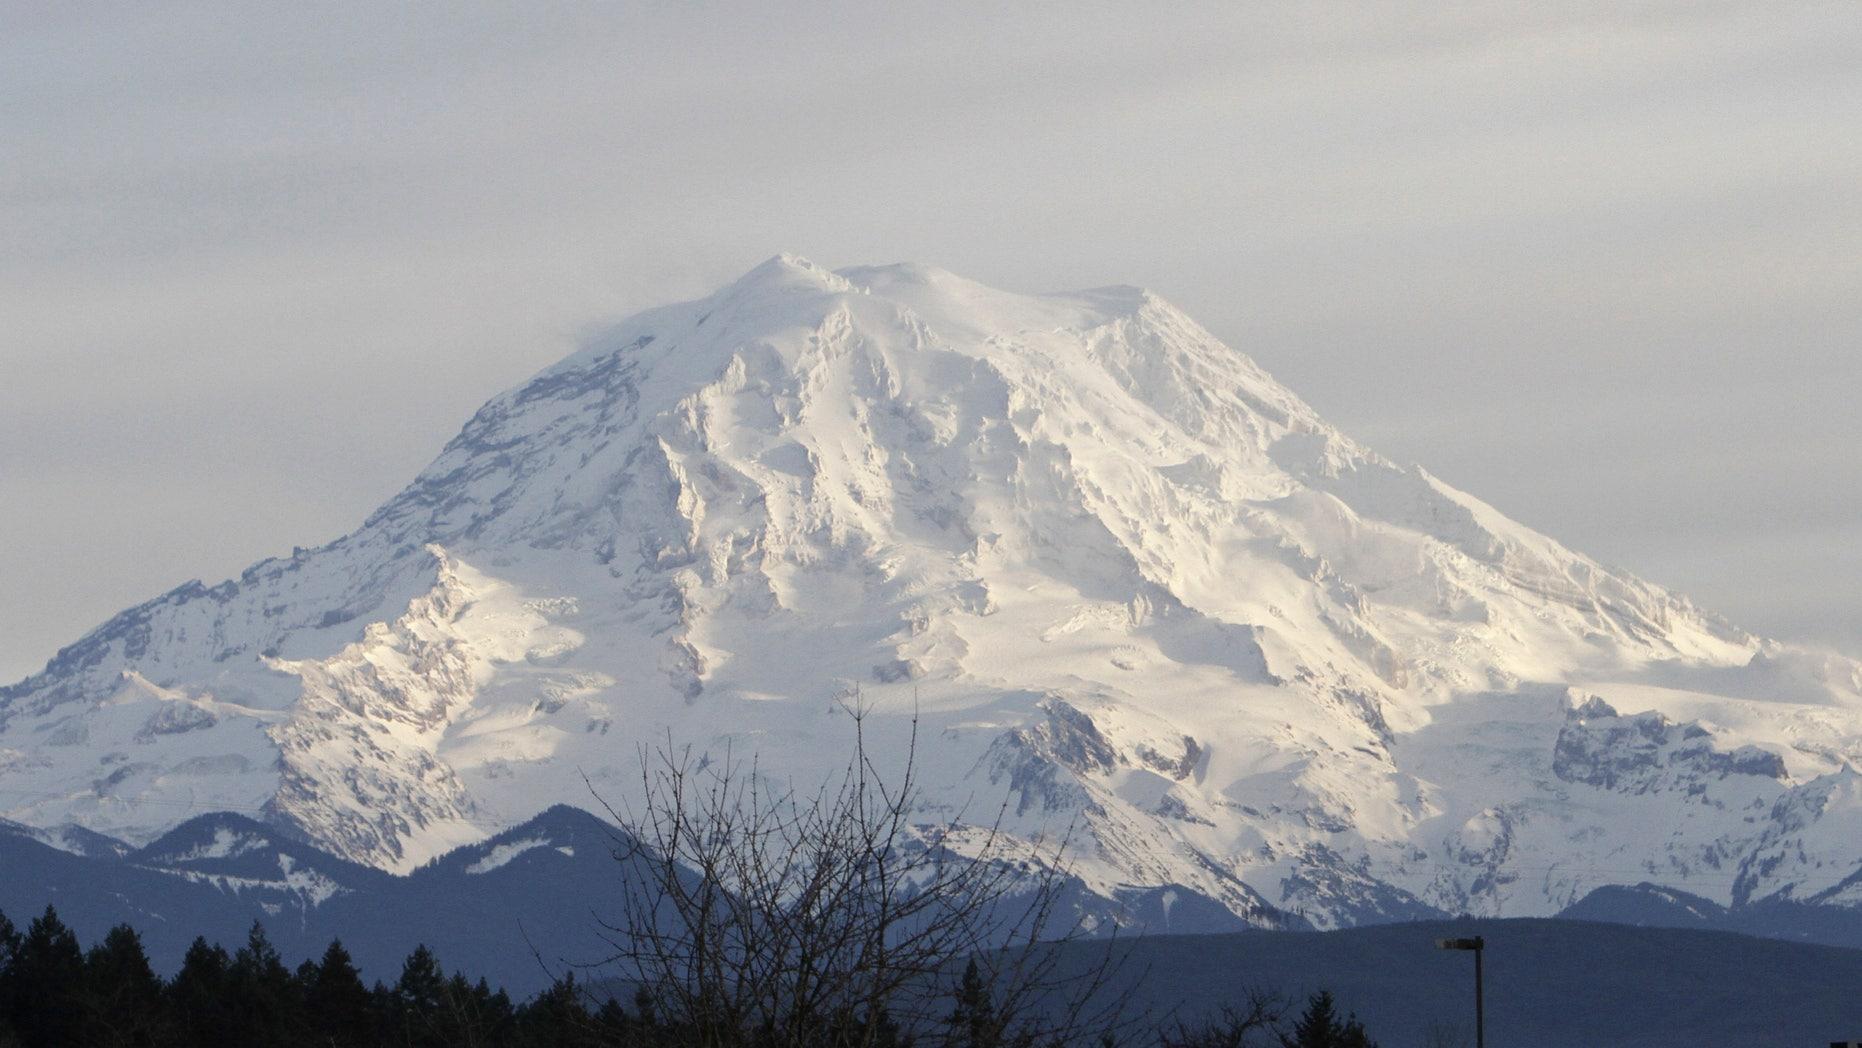 Jan. 1, 2012: A view of Mount Rainier in Washington state.